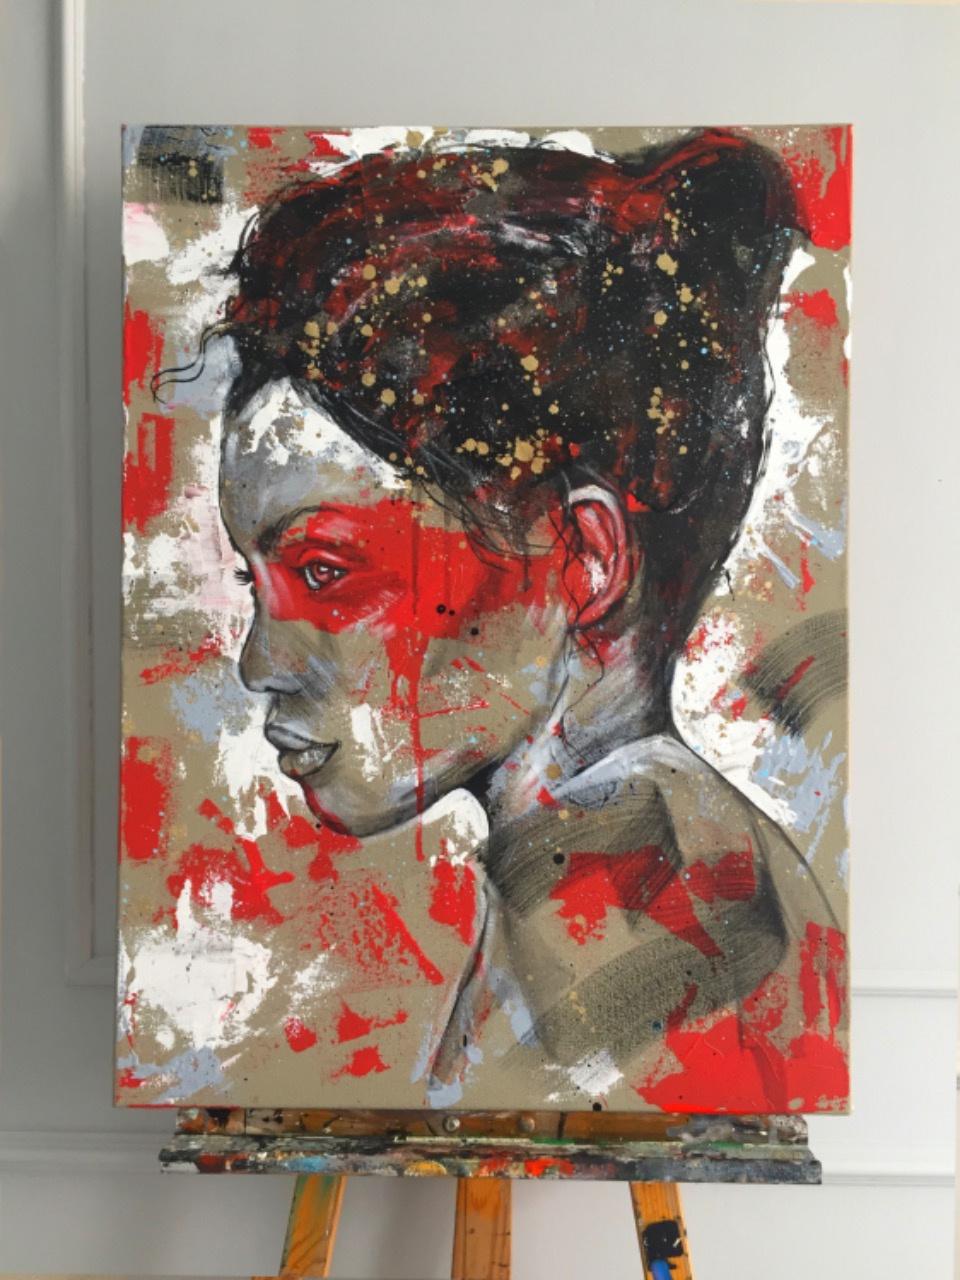 Vasily Vladimirovich Kizinёk. Abstract portrait 05